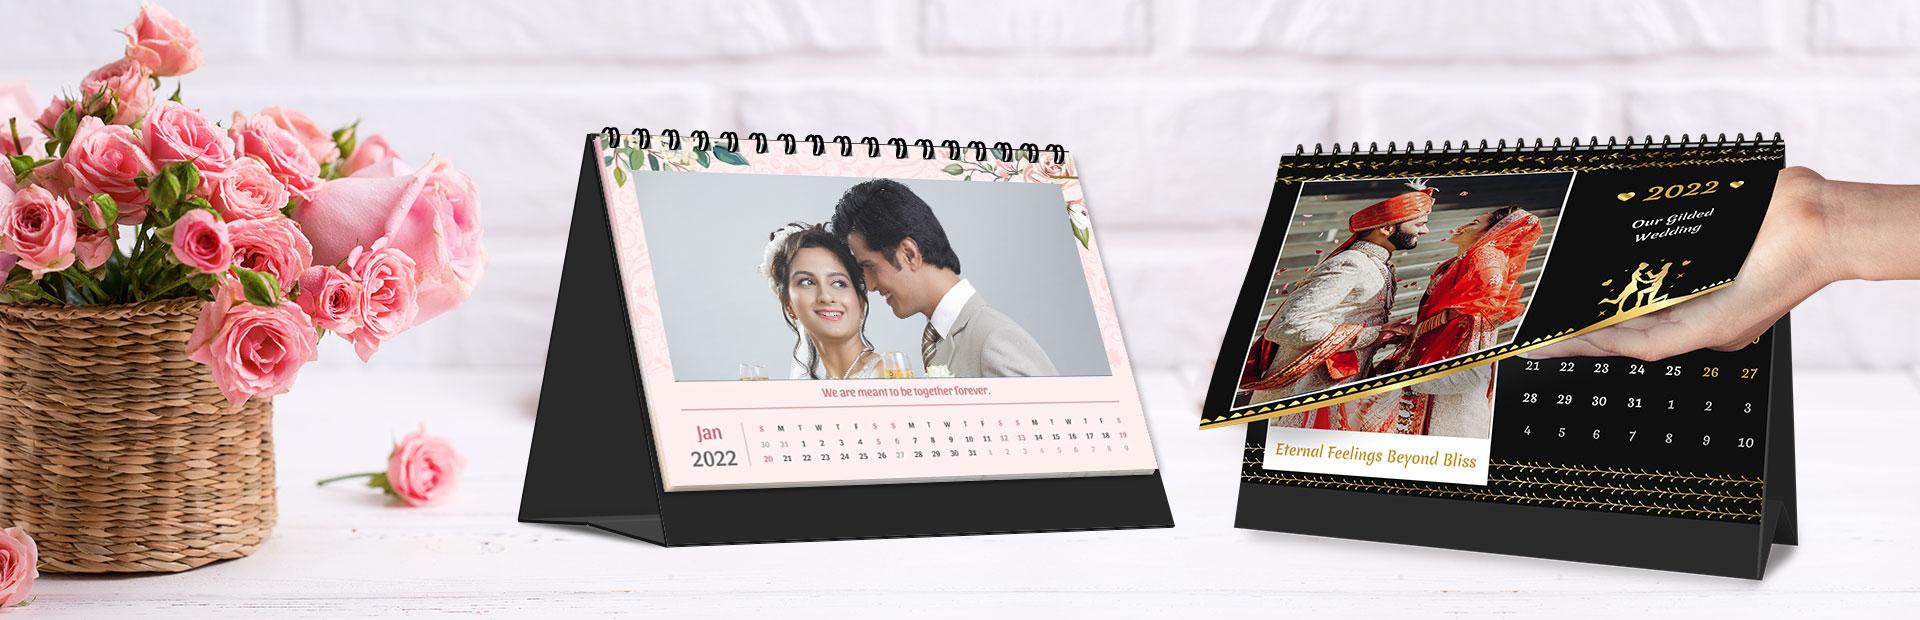 Wedding Desk Calendars Online